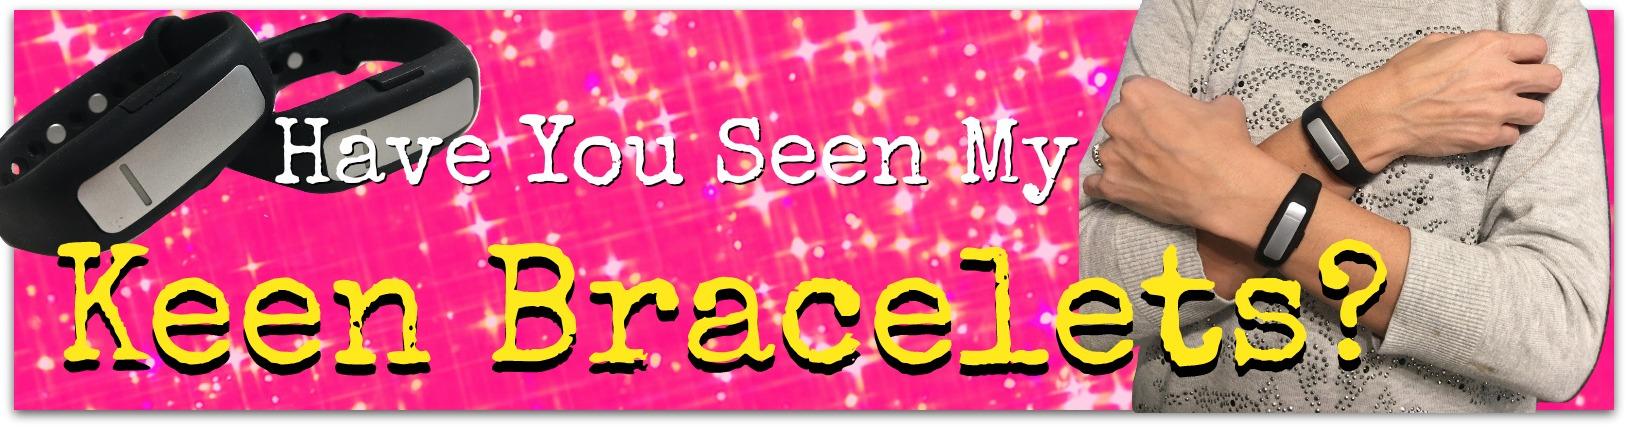 Keen Bracelet Reviews